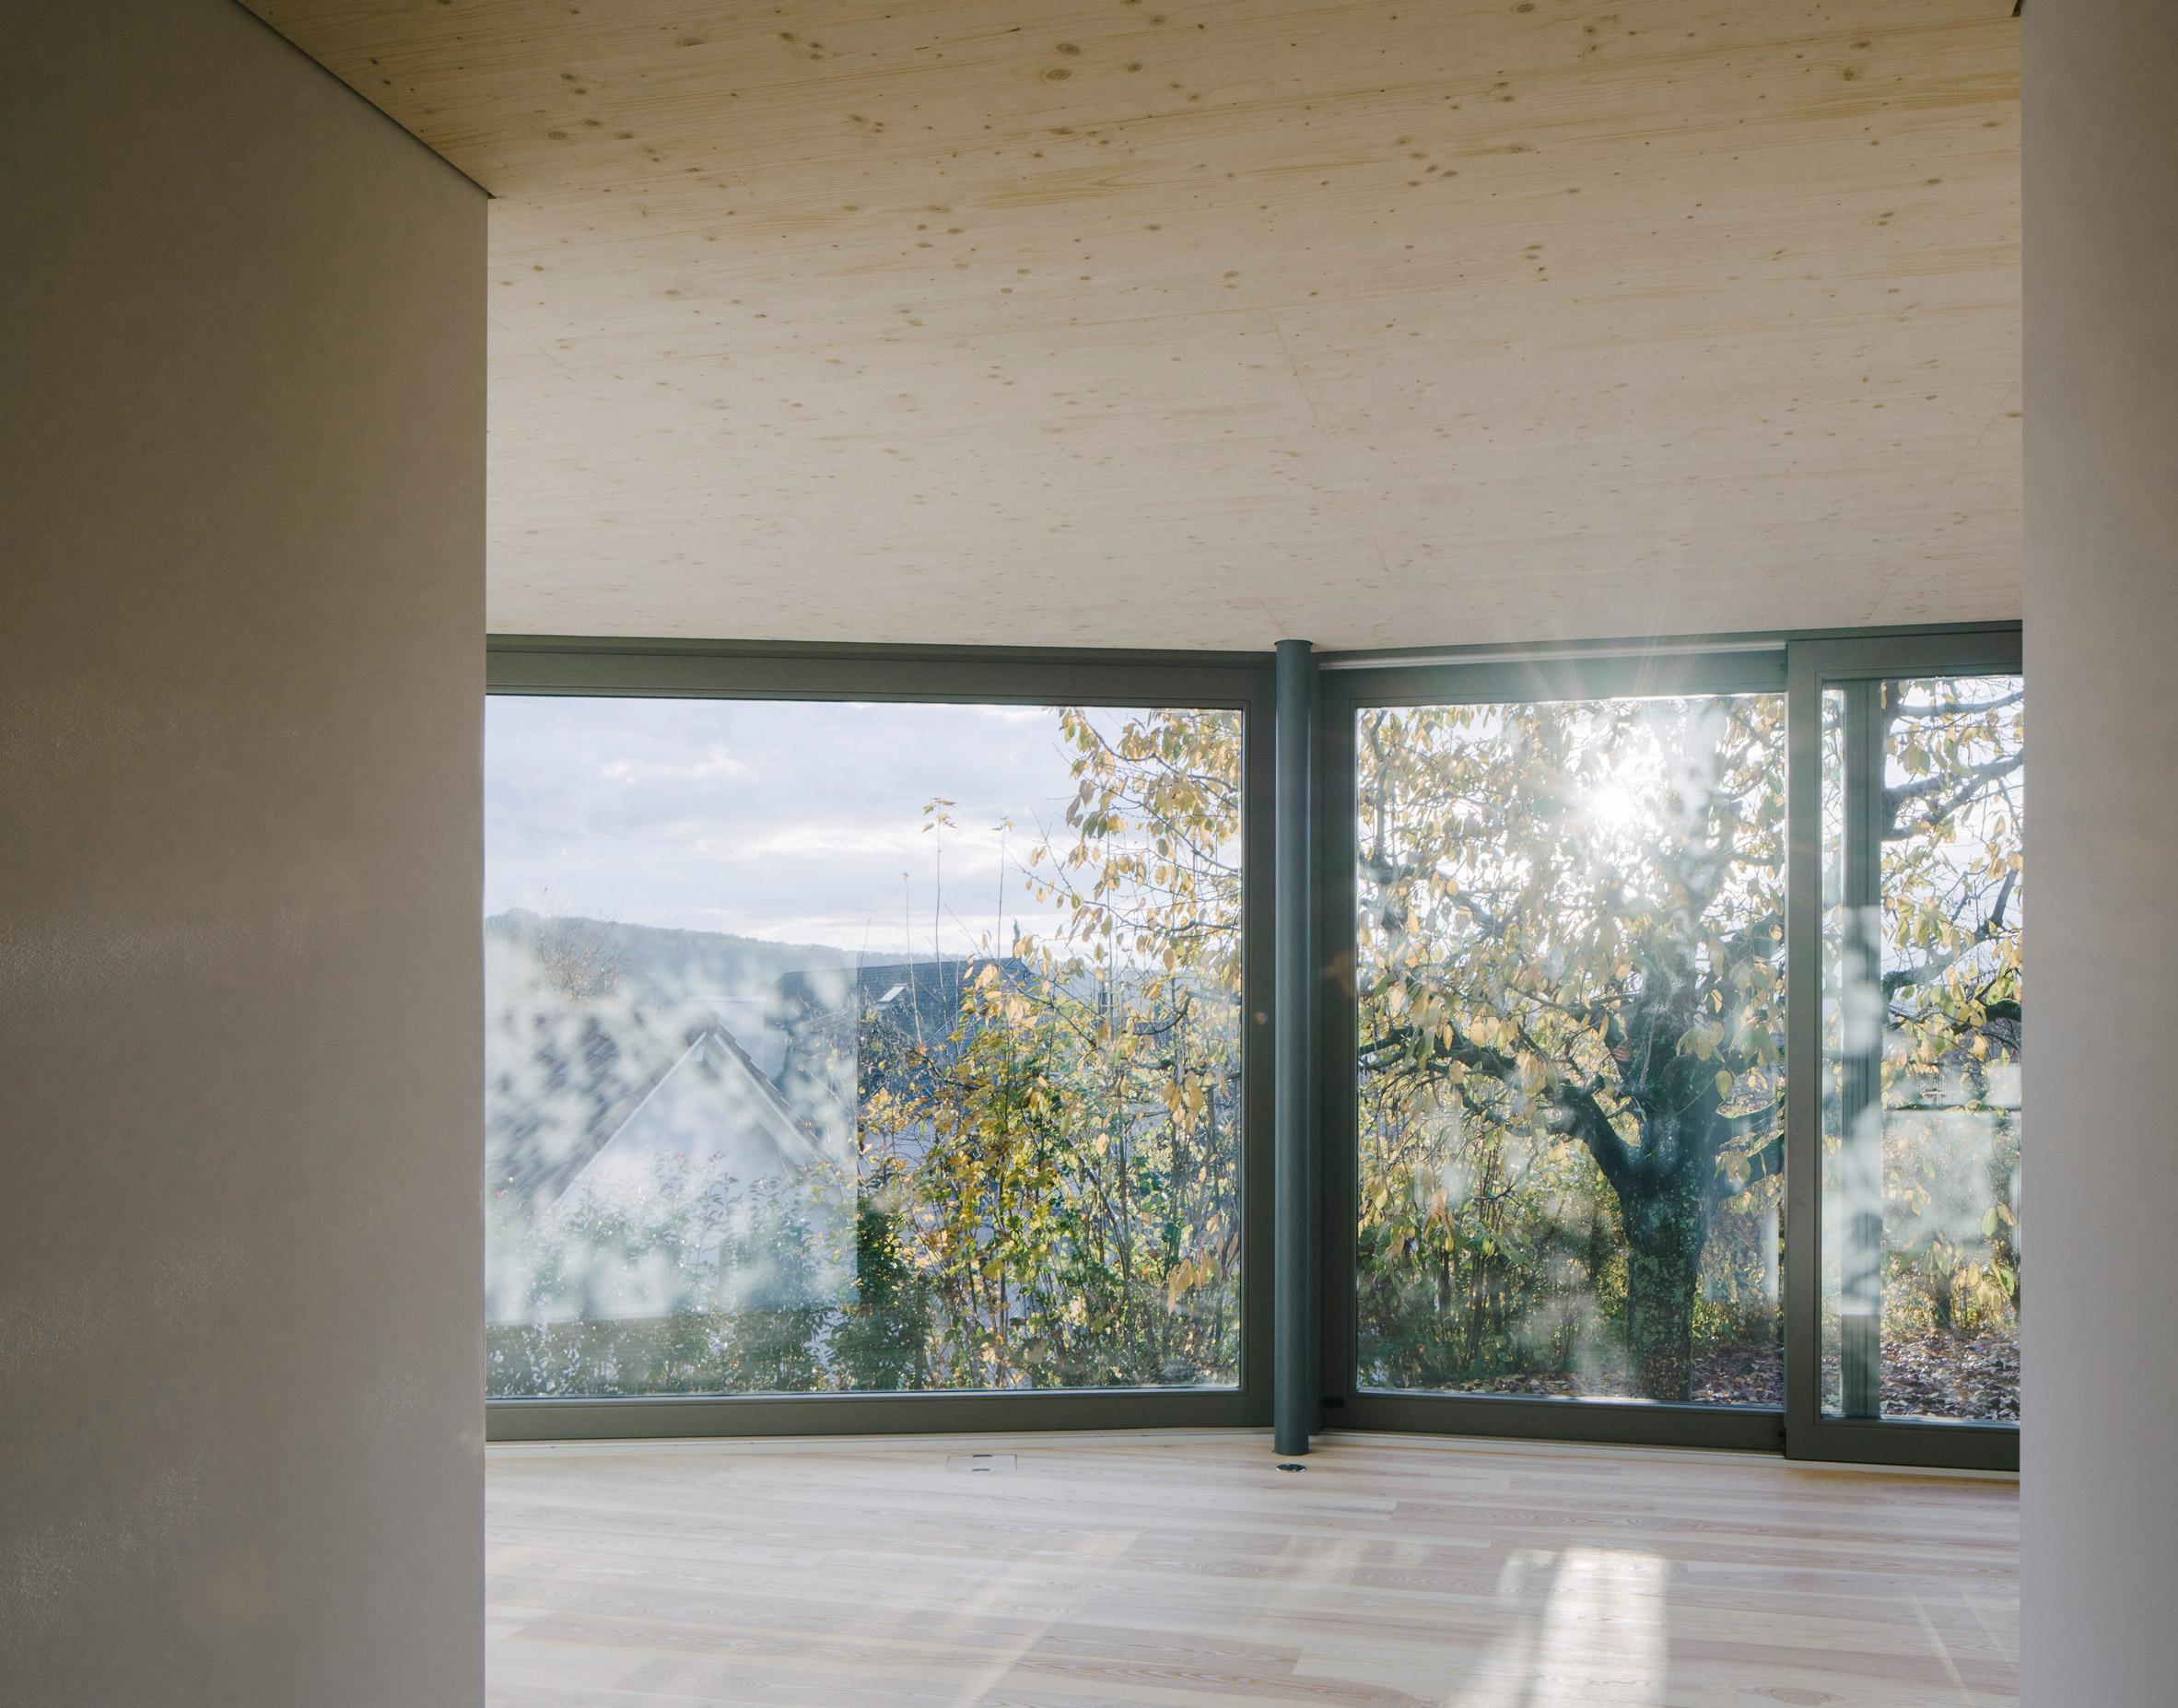 Jan Skuratowski's House M